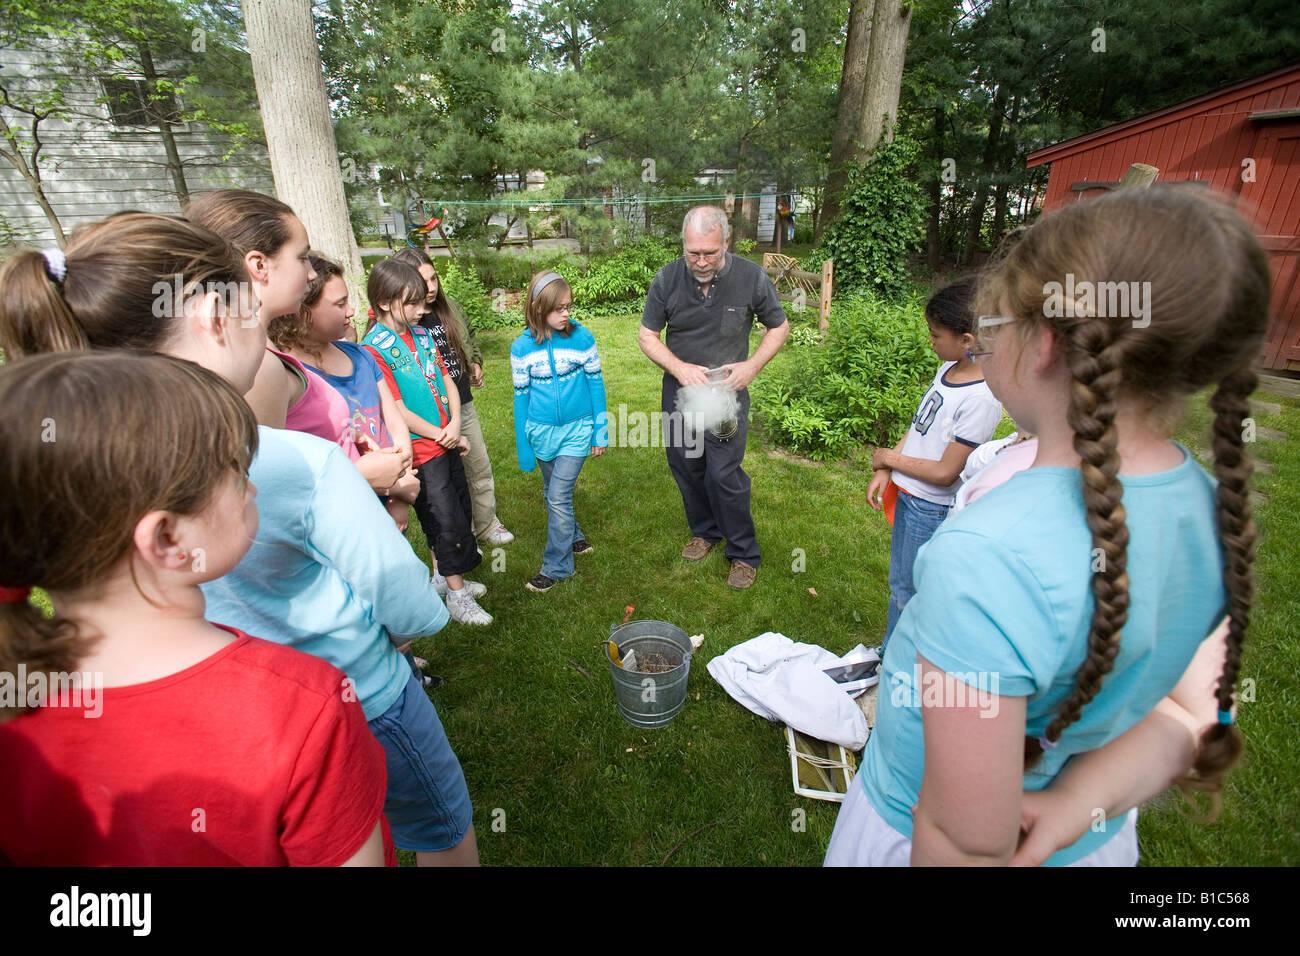 Beekeeper Rich Wieske teaches members of a Girl Scout troop about honey bees and beekeeping - Stock Image